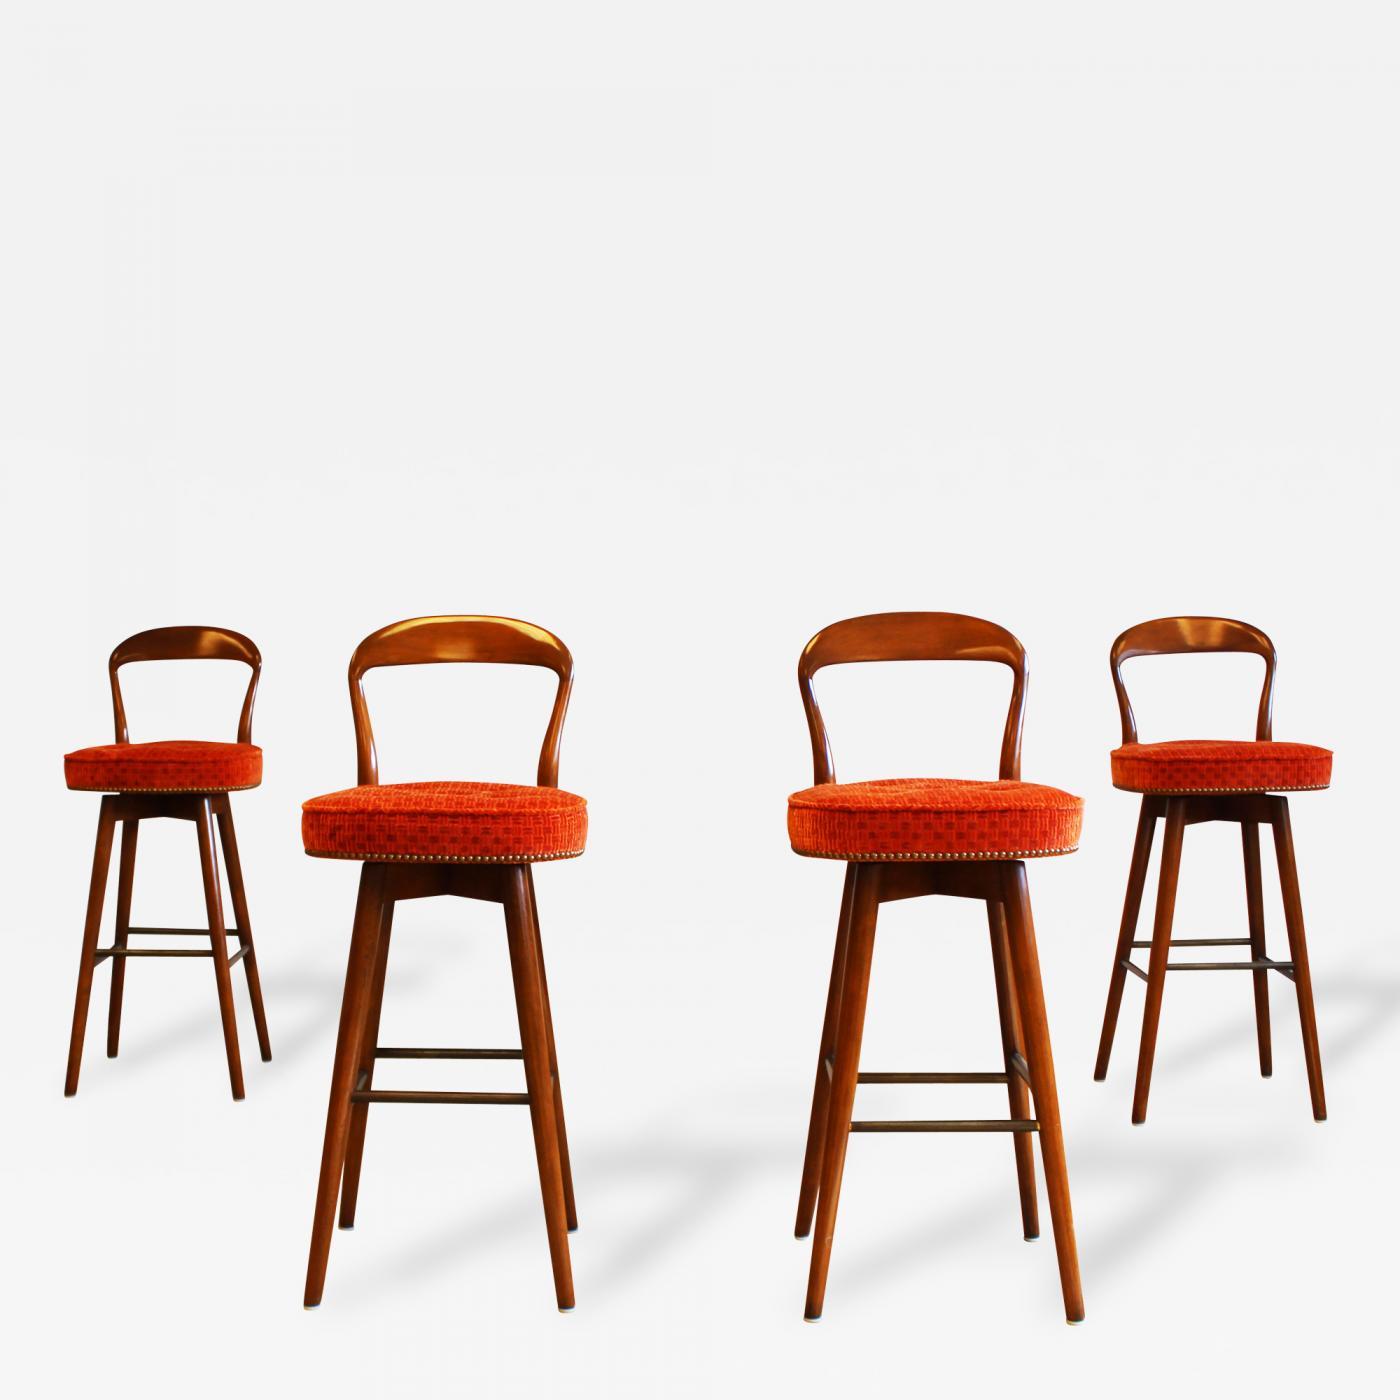 Listings furniture seating stools · henry rosengren hansen mid century modern